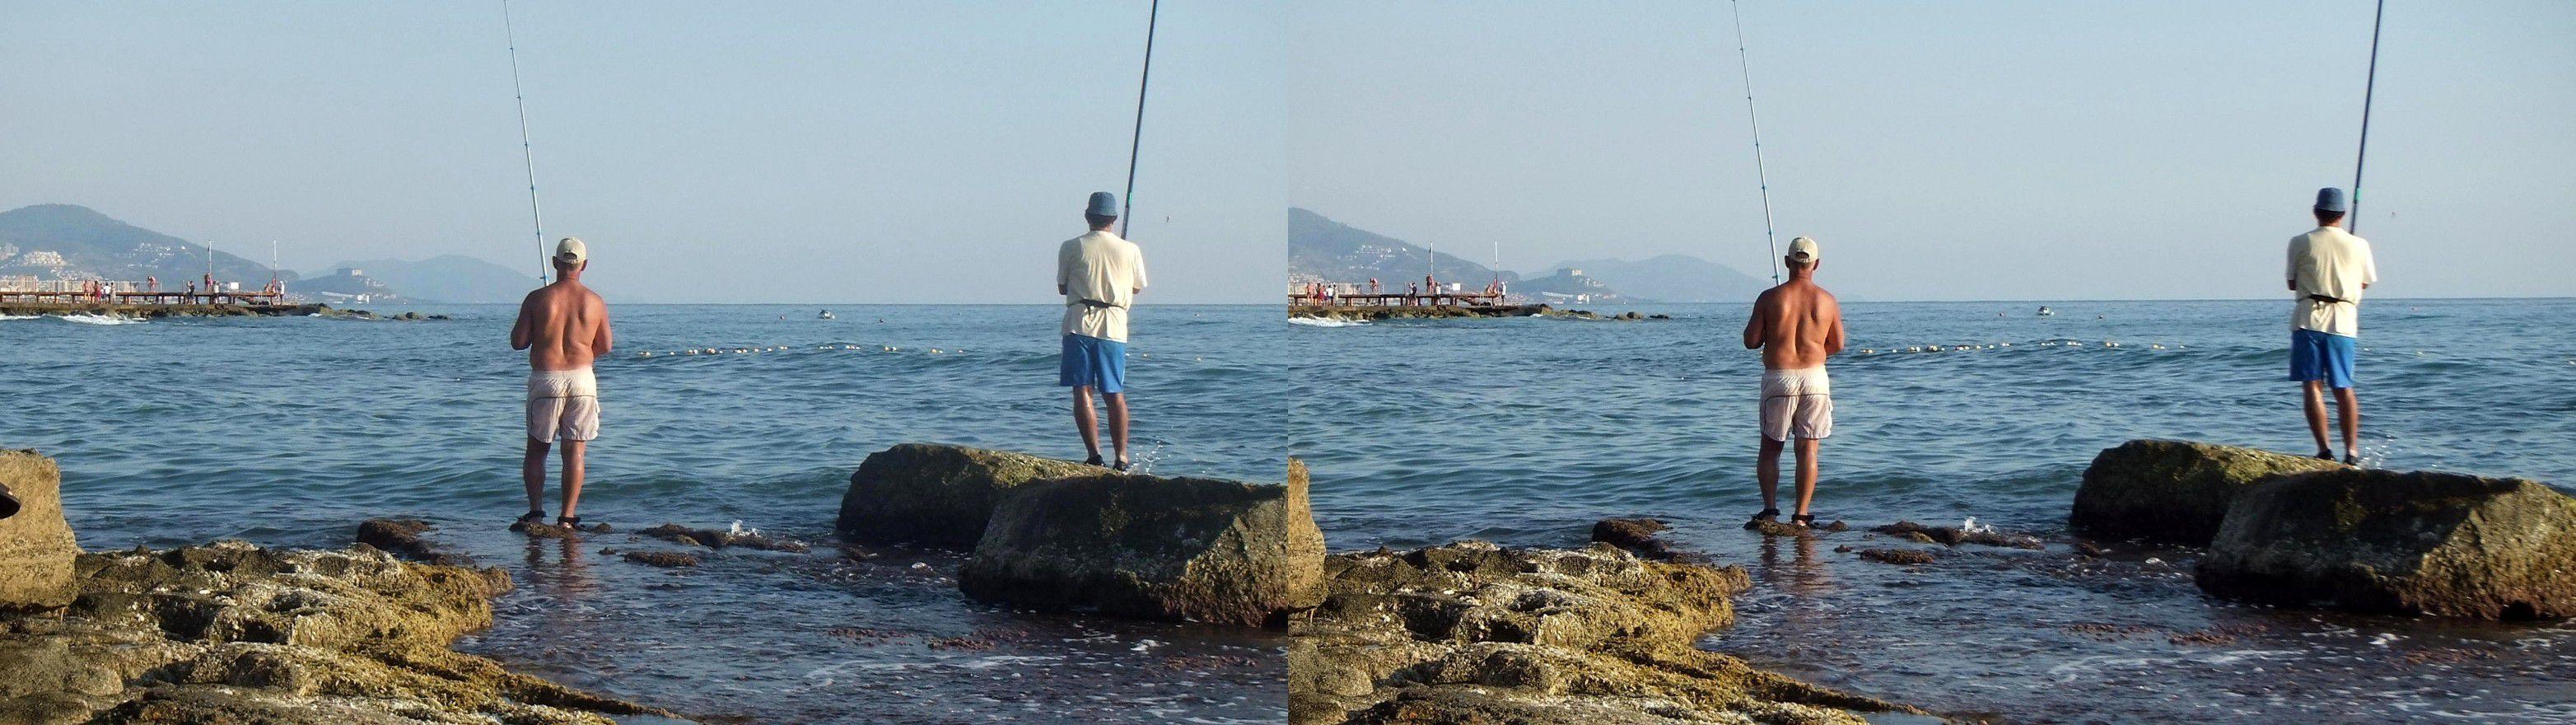 рыбу ловить на море в испании